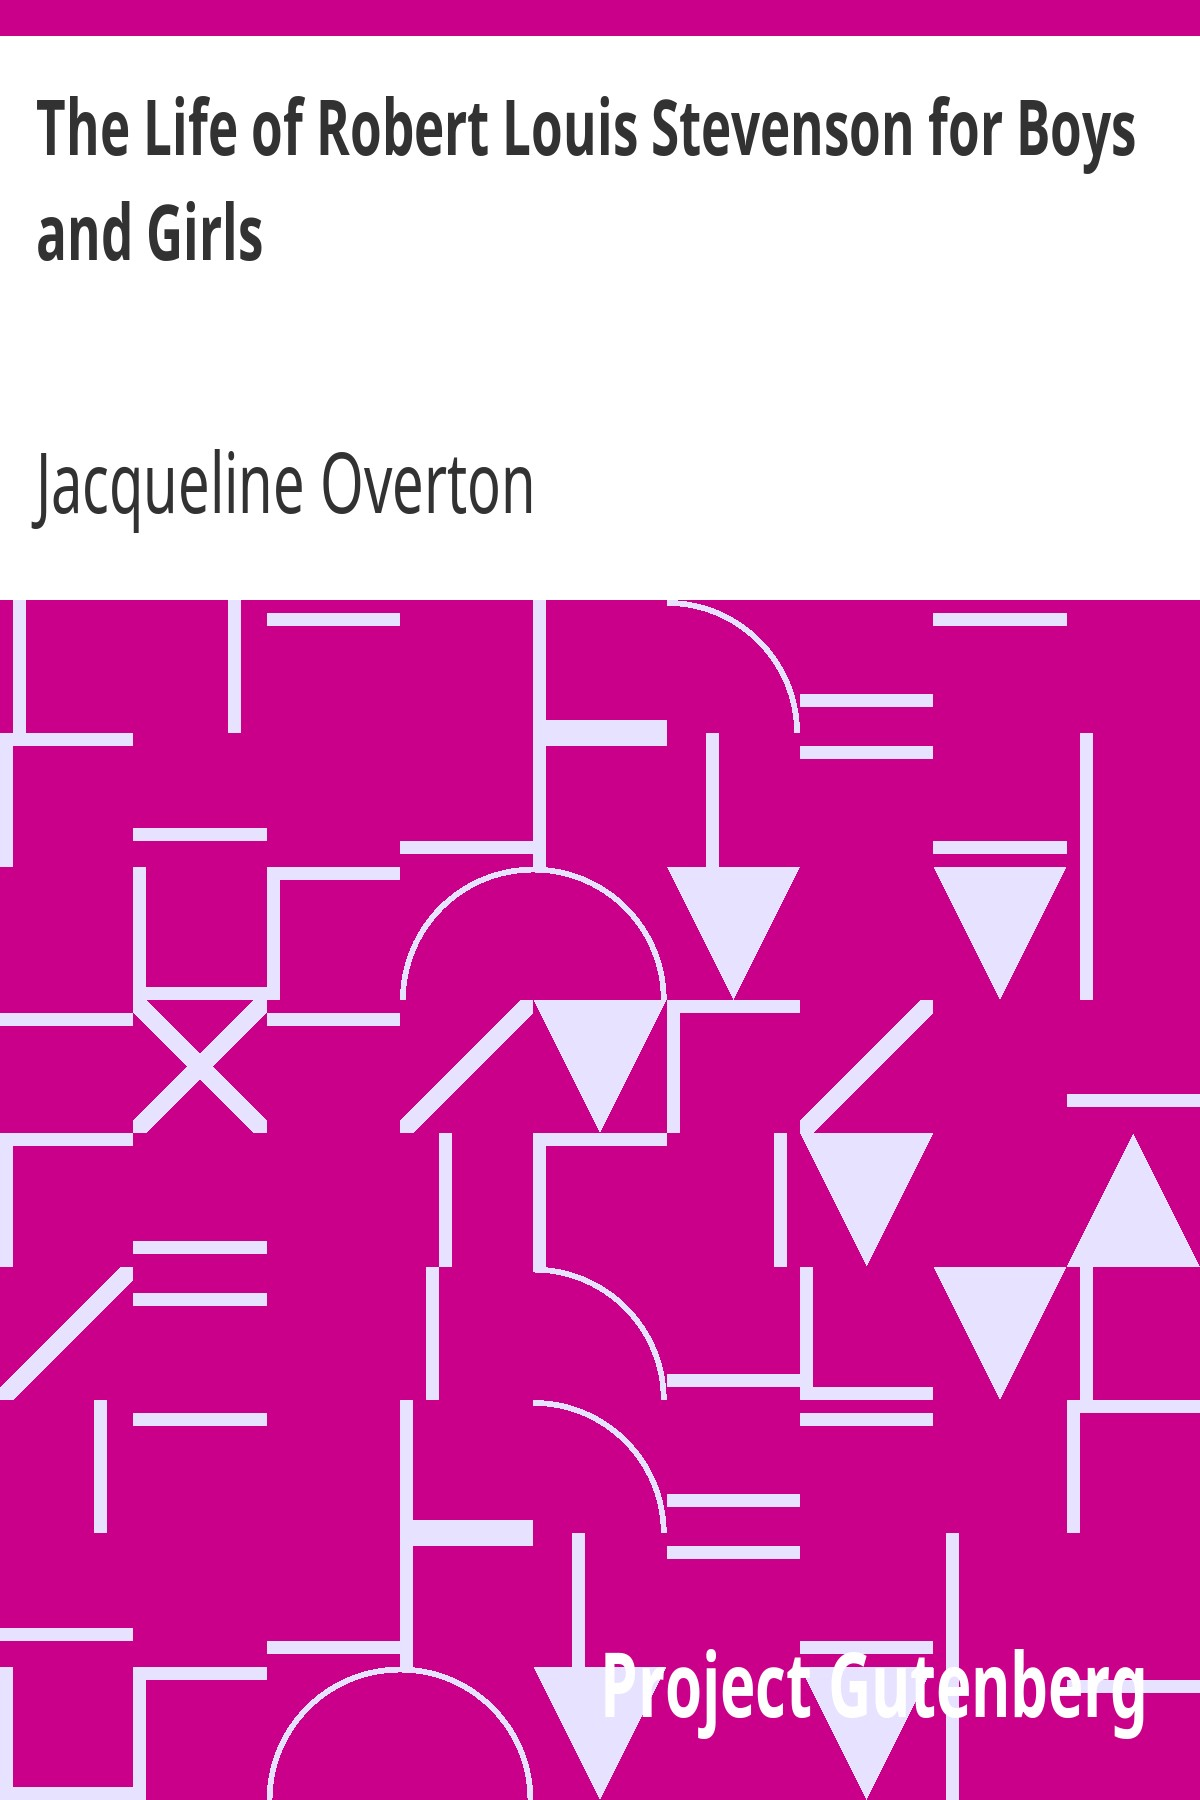 Jacqueline Overton The Life of Robert Louis Stevenson for Boys and Girls